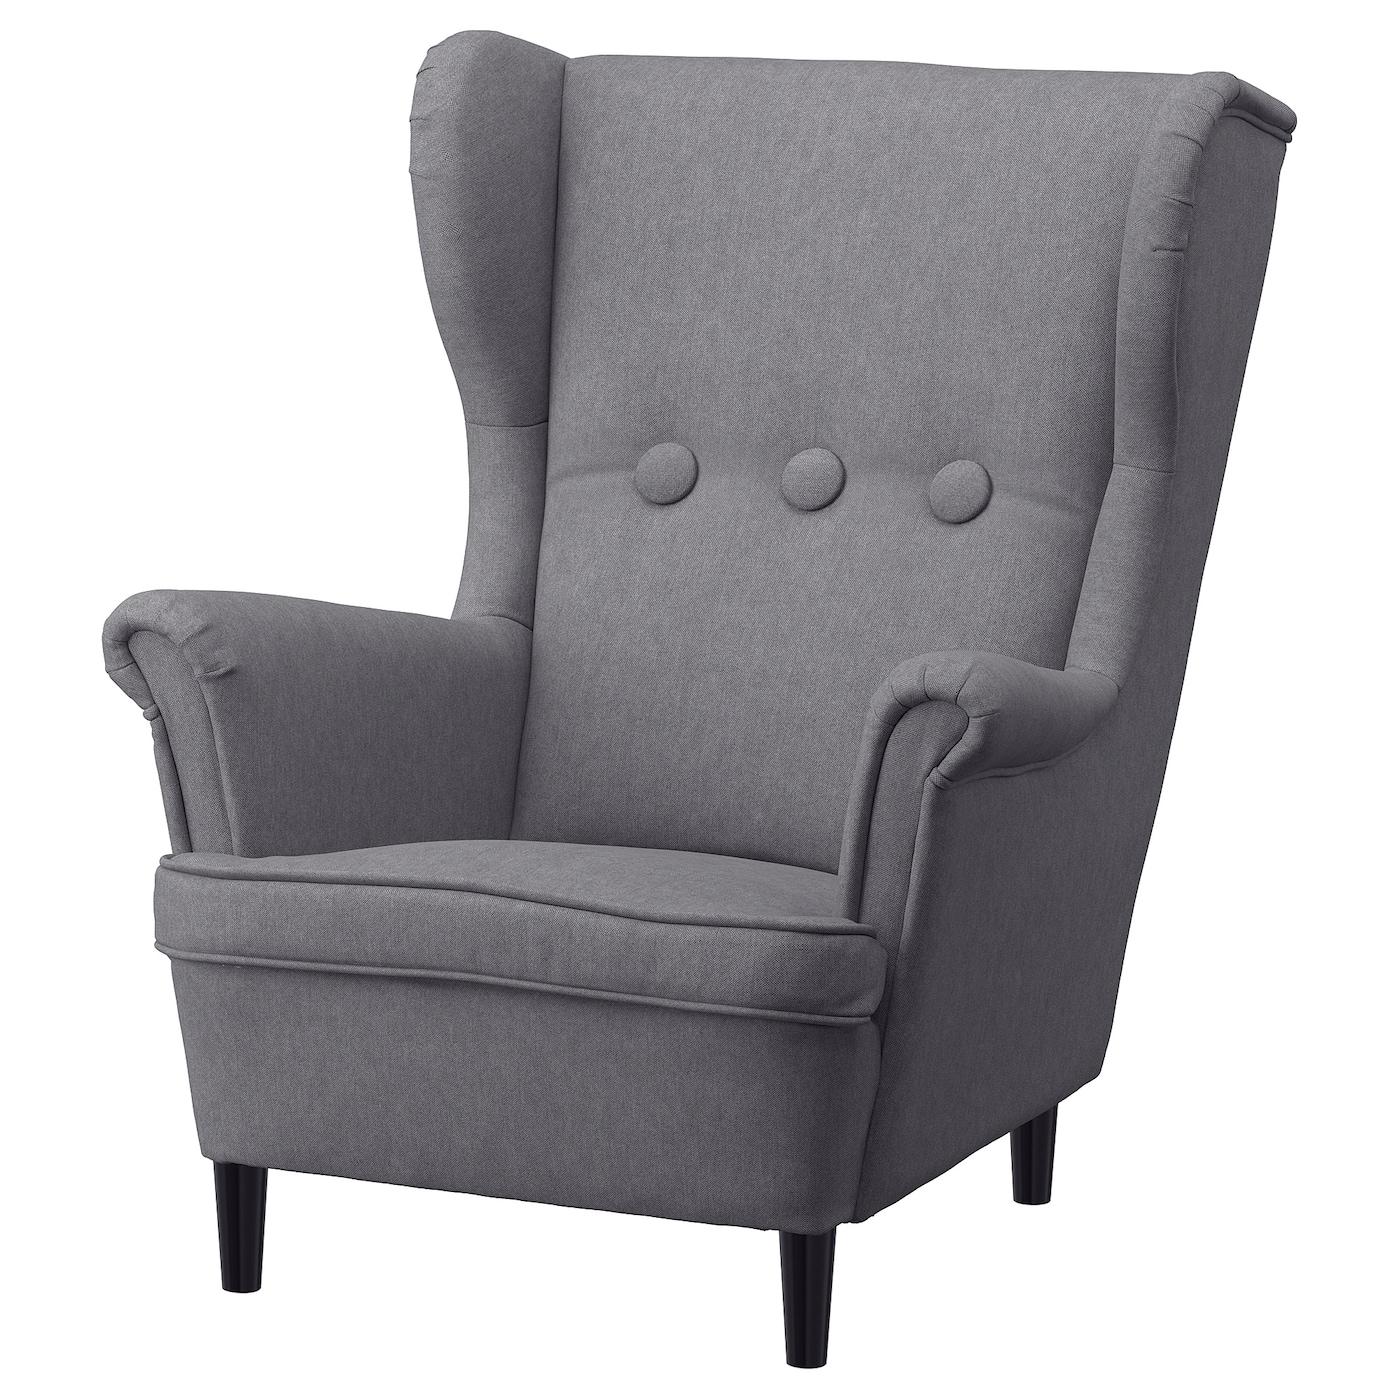 STRANDMON Children's arm chair - Vissle gray - IKEA